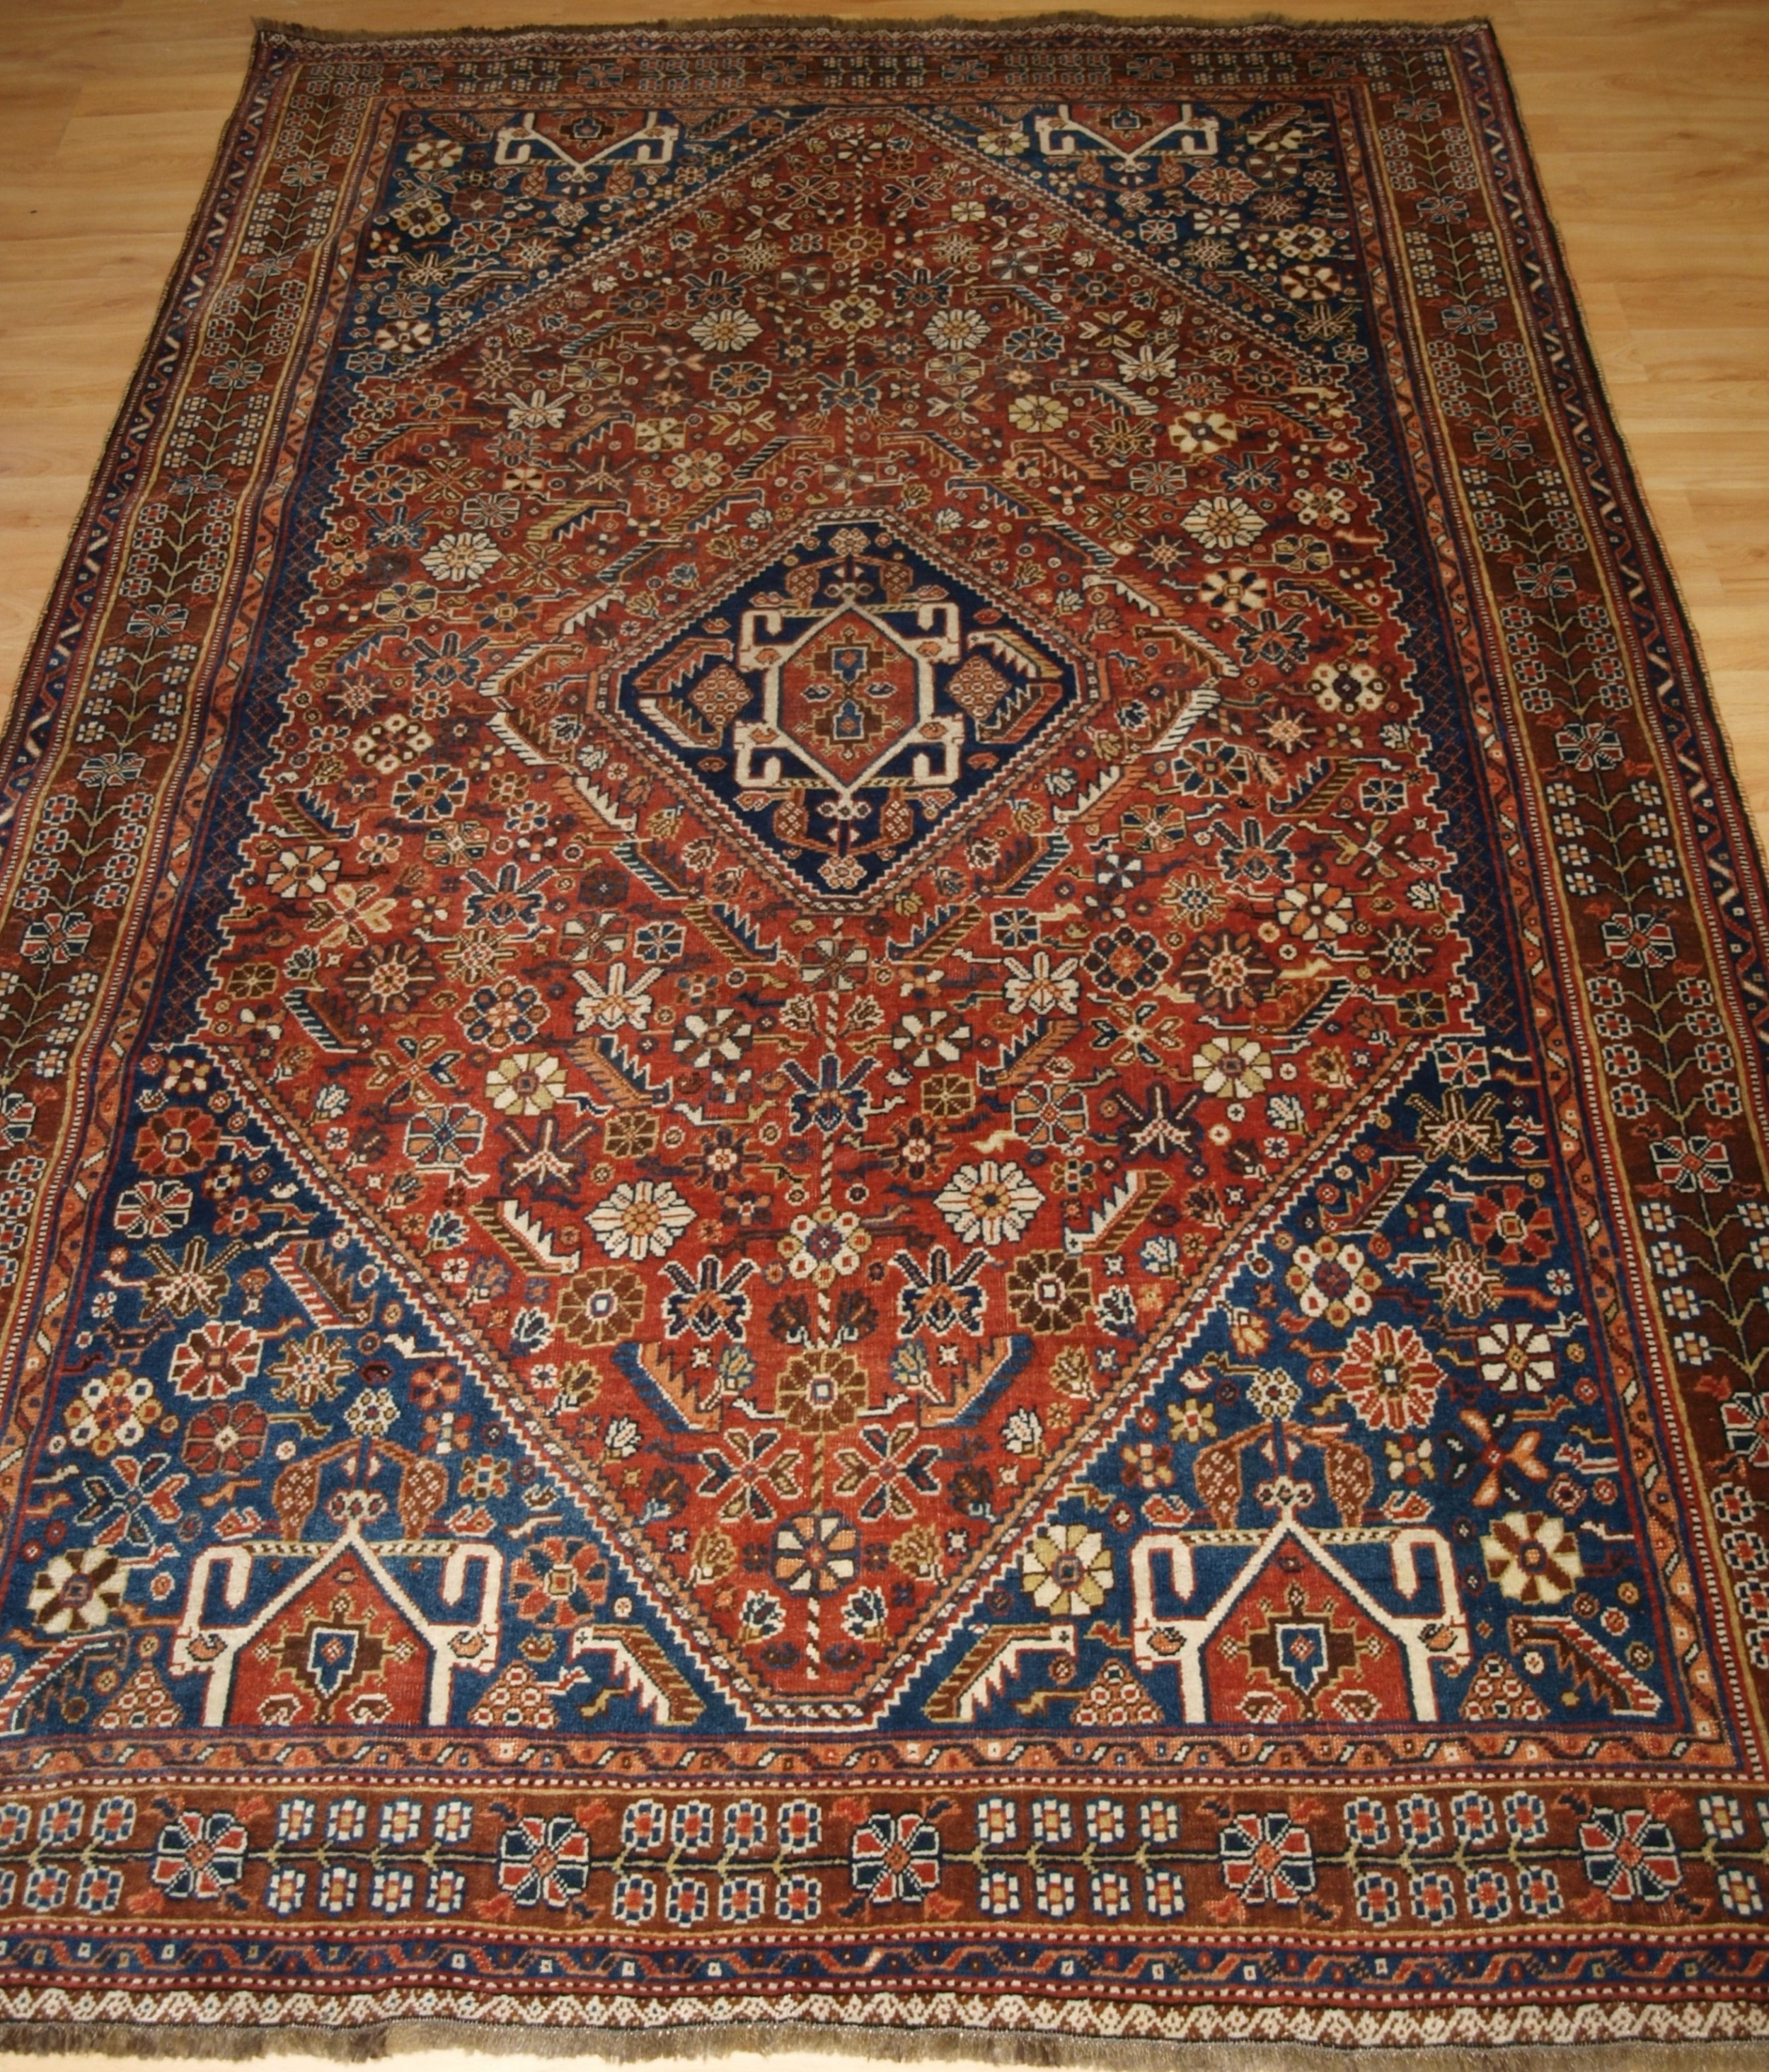 antique south west persian qashqai rug tribal design great colour circa 1900